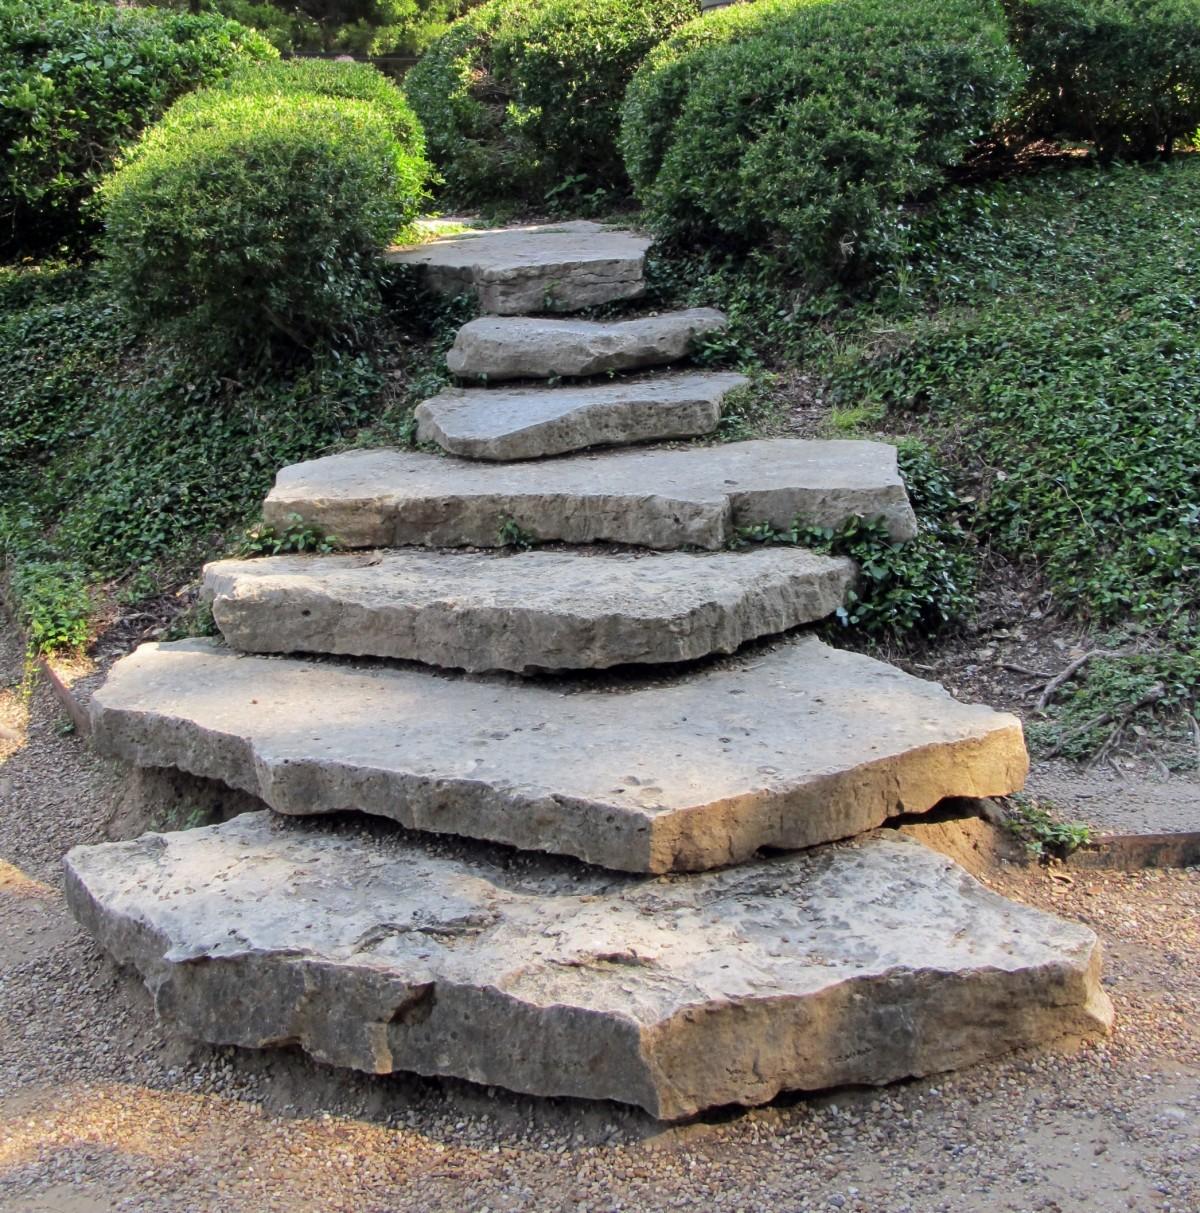 stone_steps_landscaping_path_garden_landscaped_rocks_stones_stairway-947991.jpg